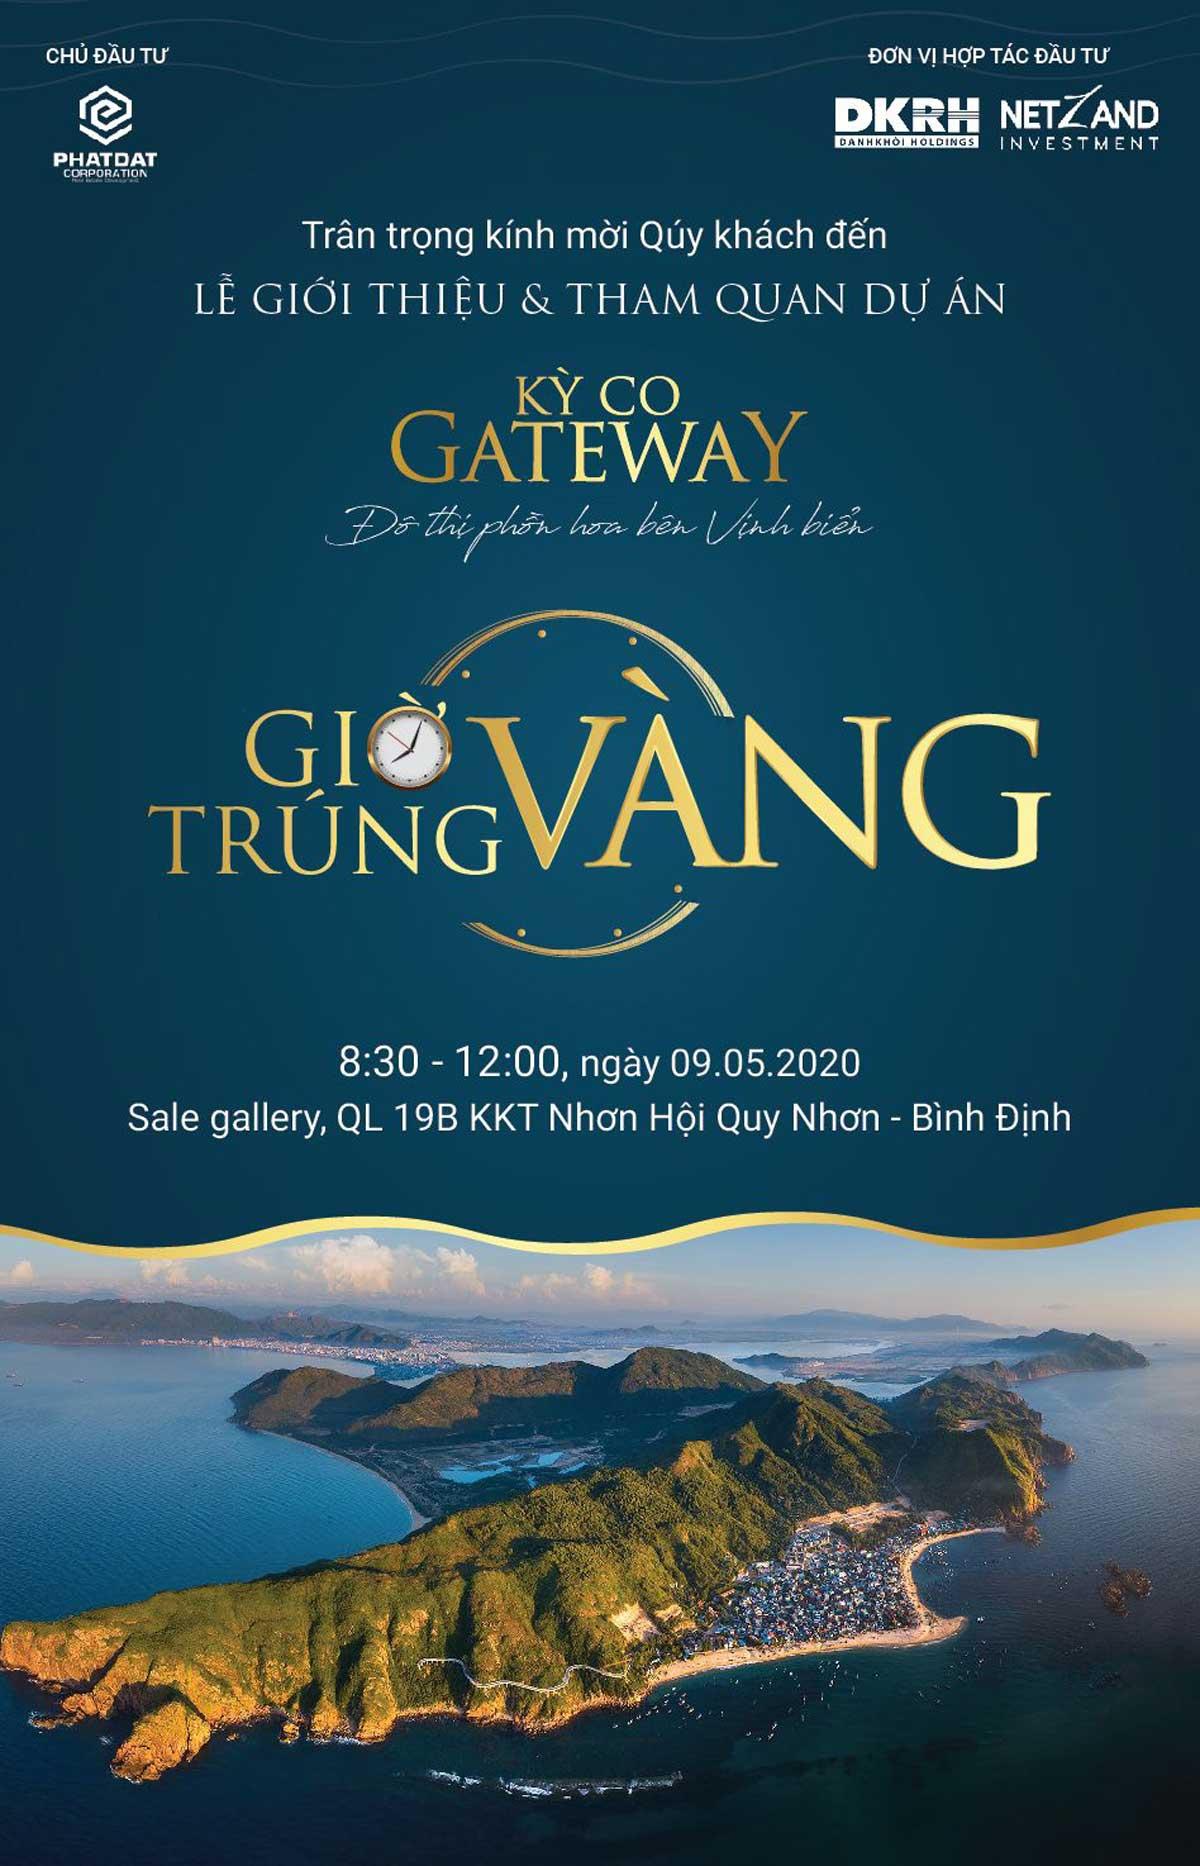 Lễ giới thiệu Tham quan dự án Kỳ Co Gateway - LỄ GIỚI THIỆU & THAM QUAN DỰ ÁN KỲ CO GATEWAY